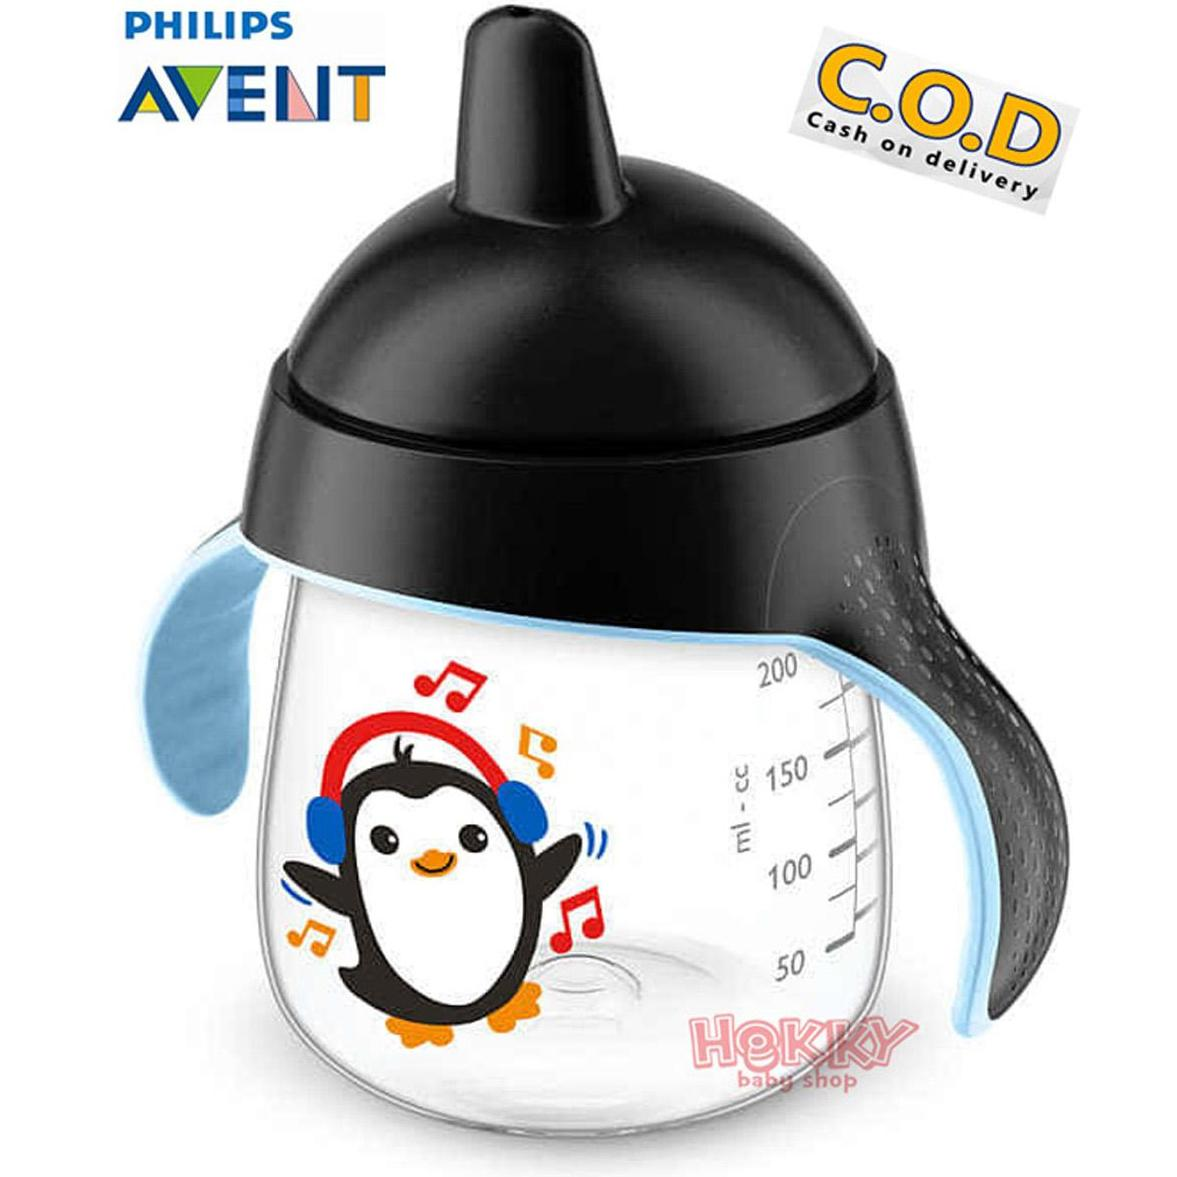 Philips Avent Original Botol Susu Bayi 125ml Natural Newbornfeeding Isi 2 Scf69023 20 Newborn Feeding Bottle Source Detail Gambar Premium Spout Cup 260ml 12m Motif Pingu Black